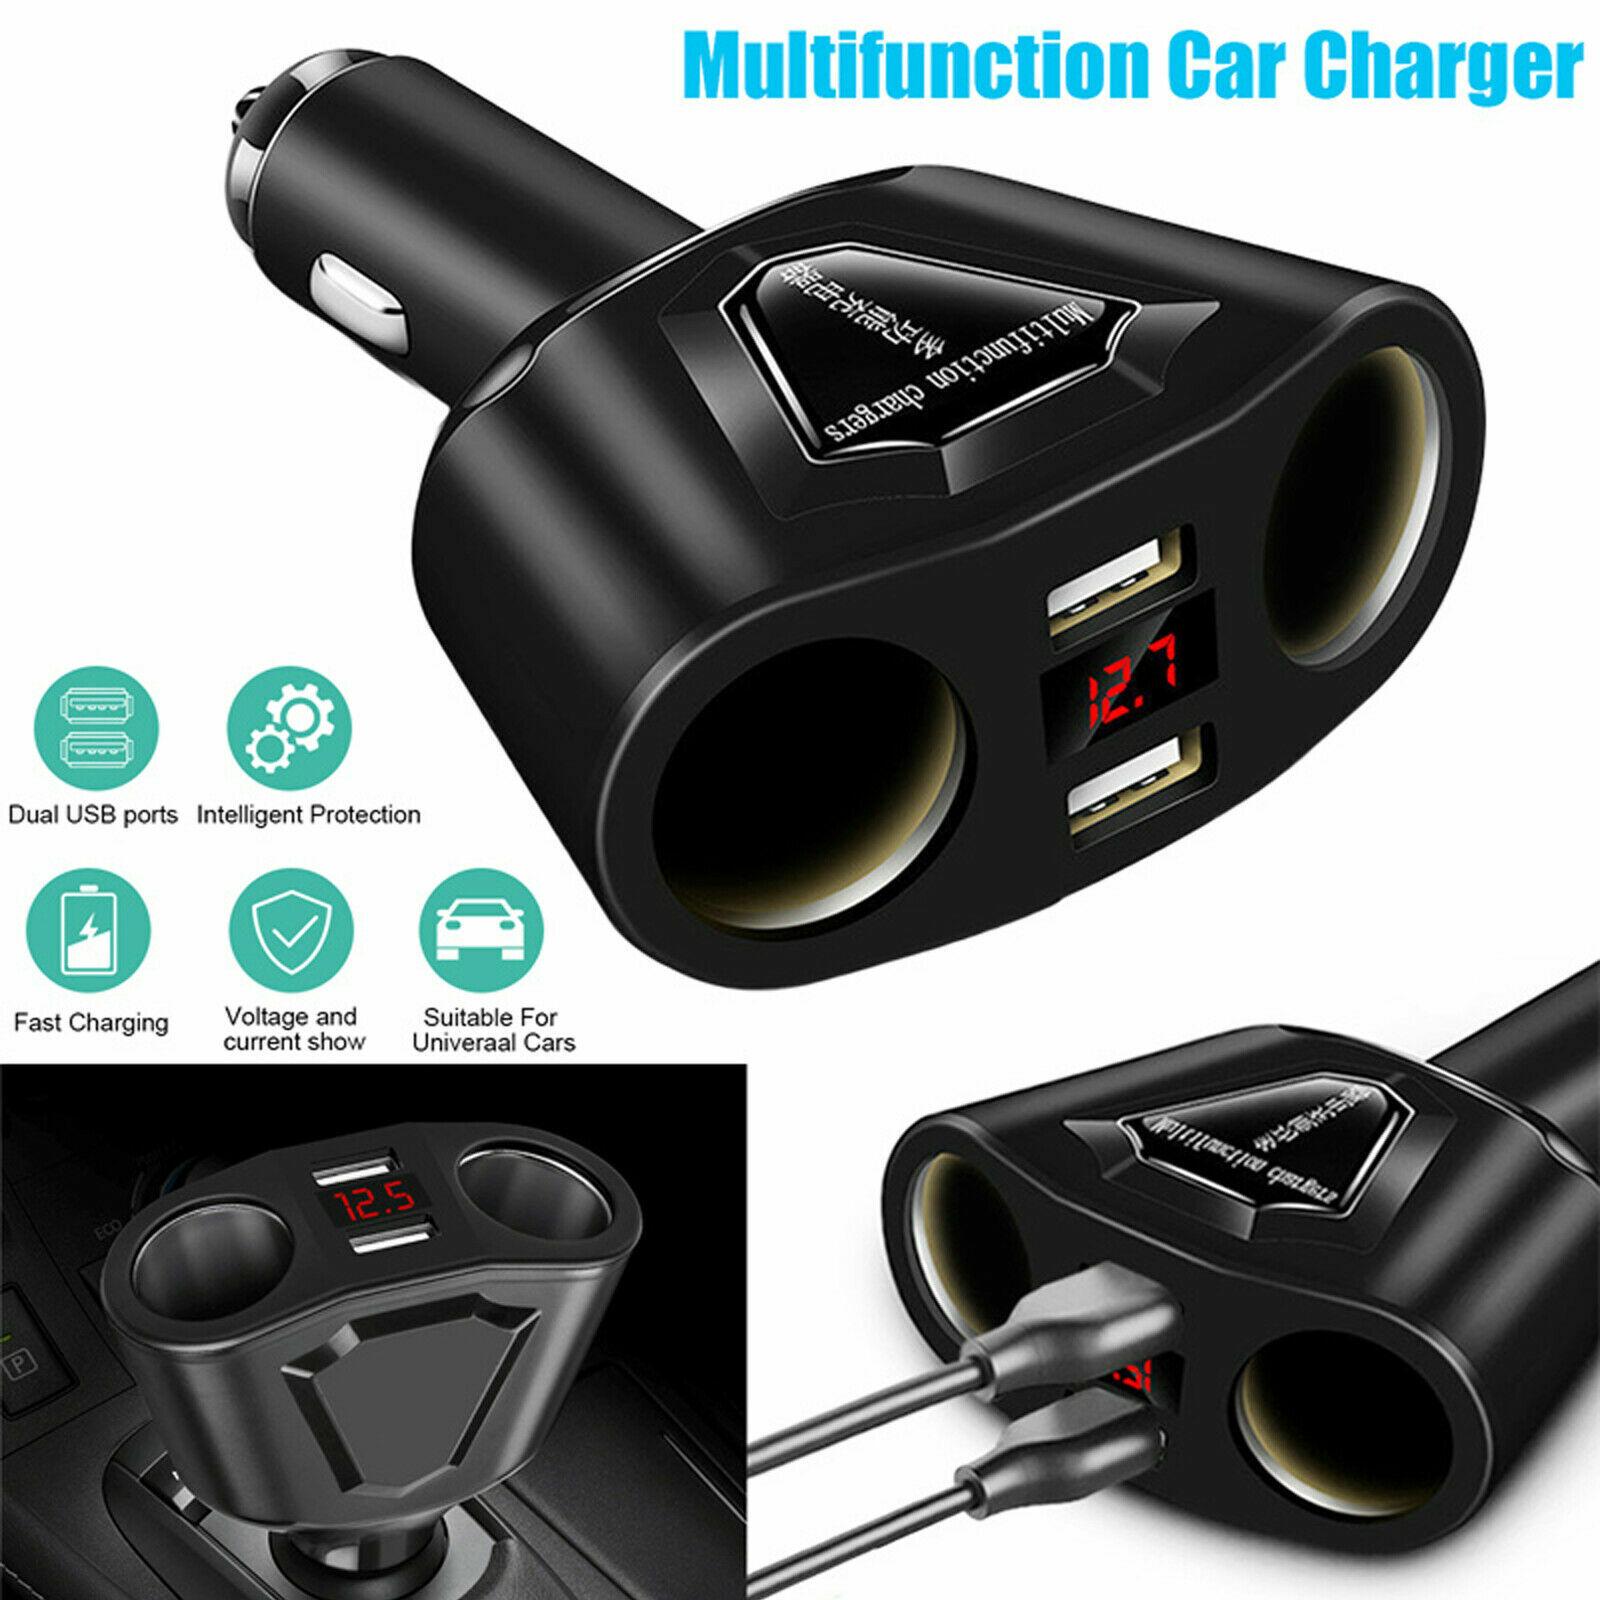 Car LCD Cigarette Lighter Socket Splitter Dual USB Charger Power Adapter DC 12V Car Electronics Accessories